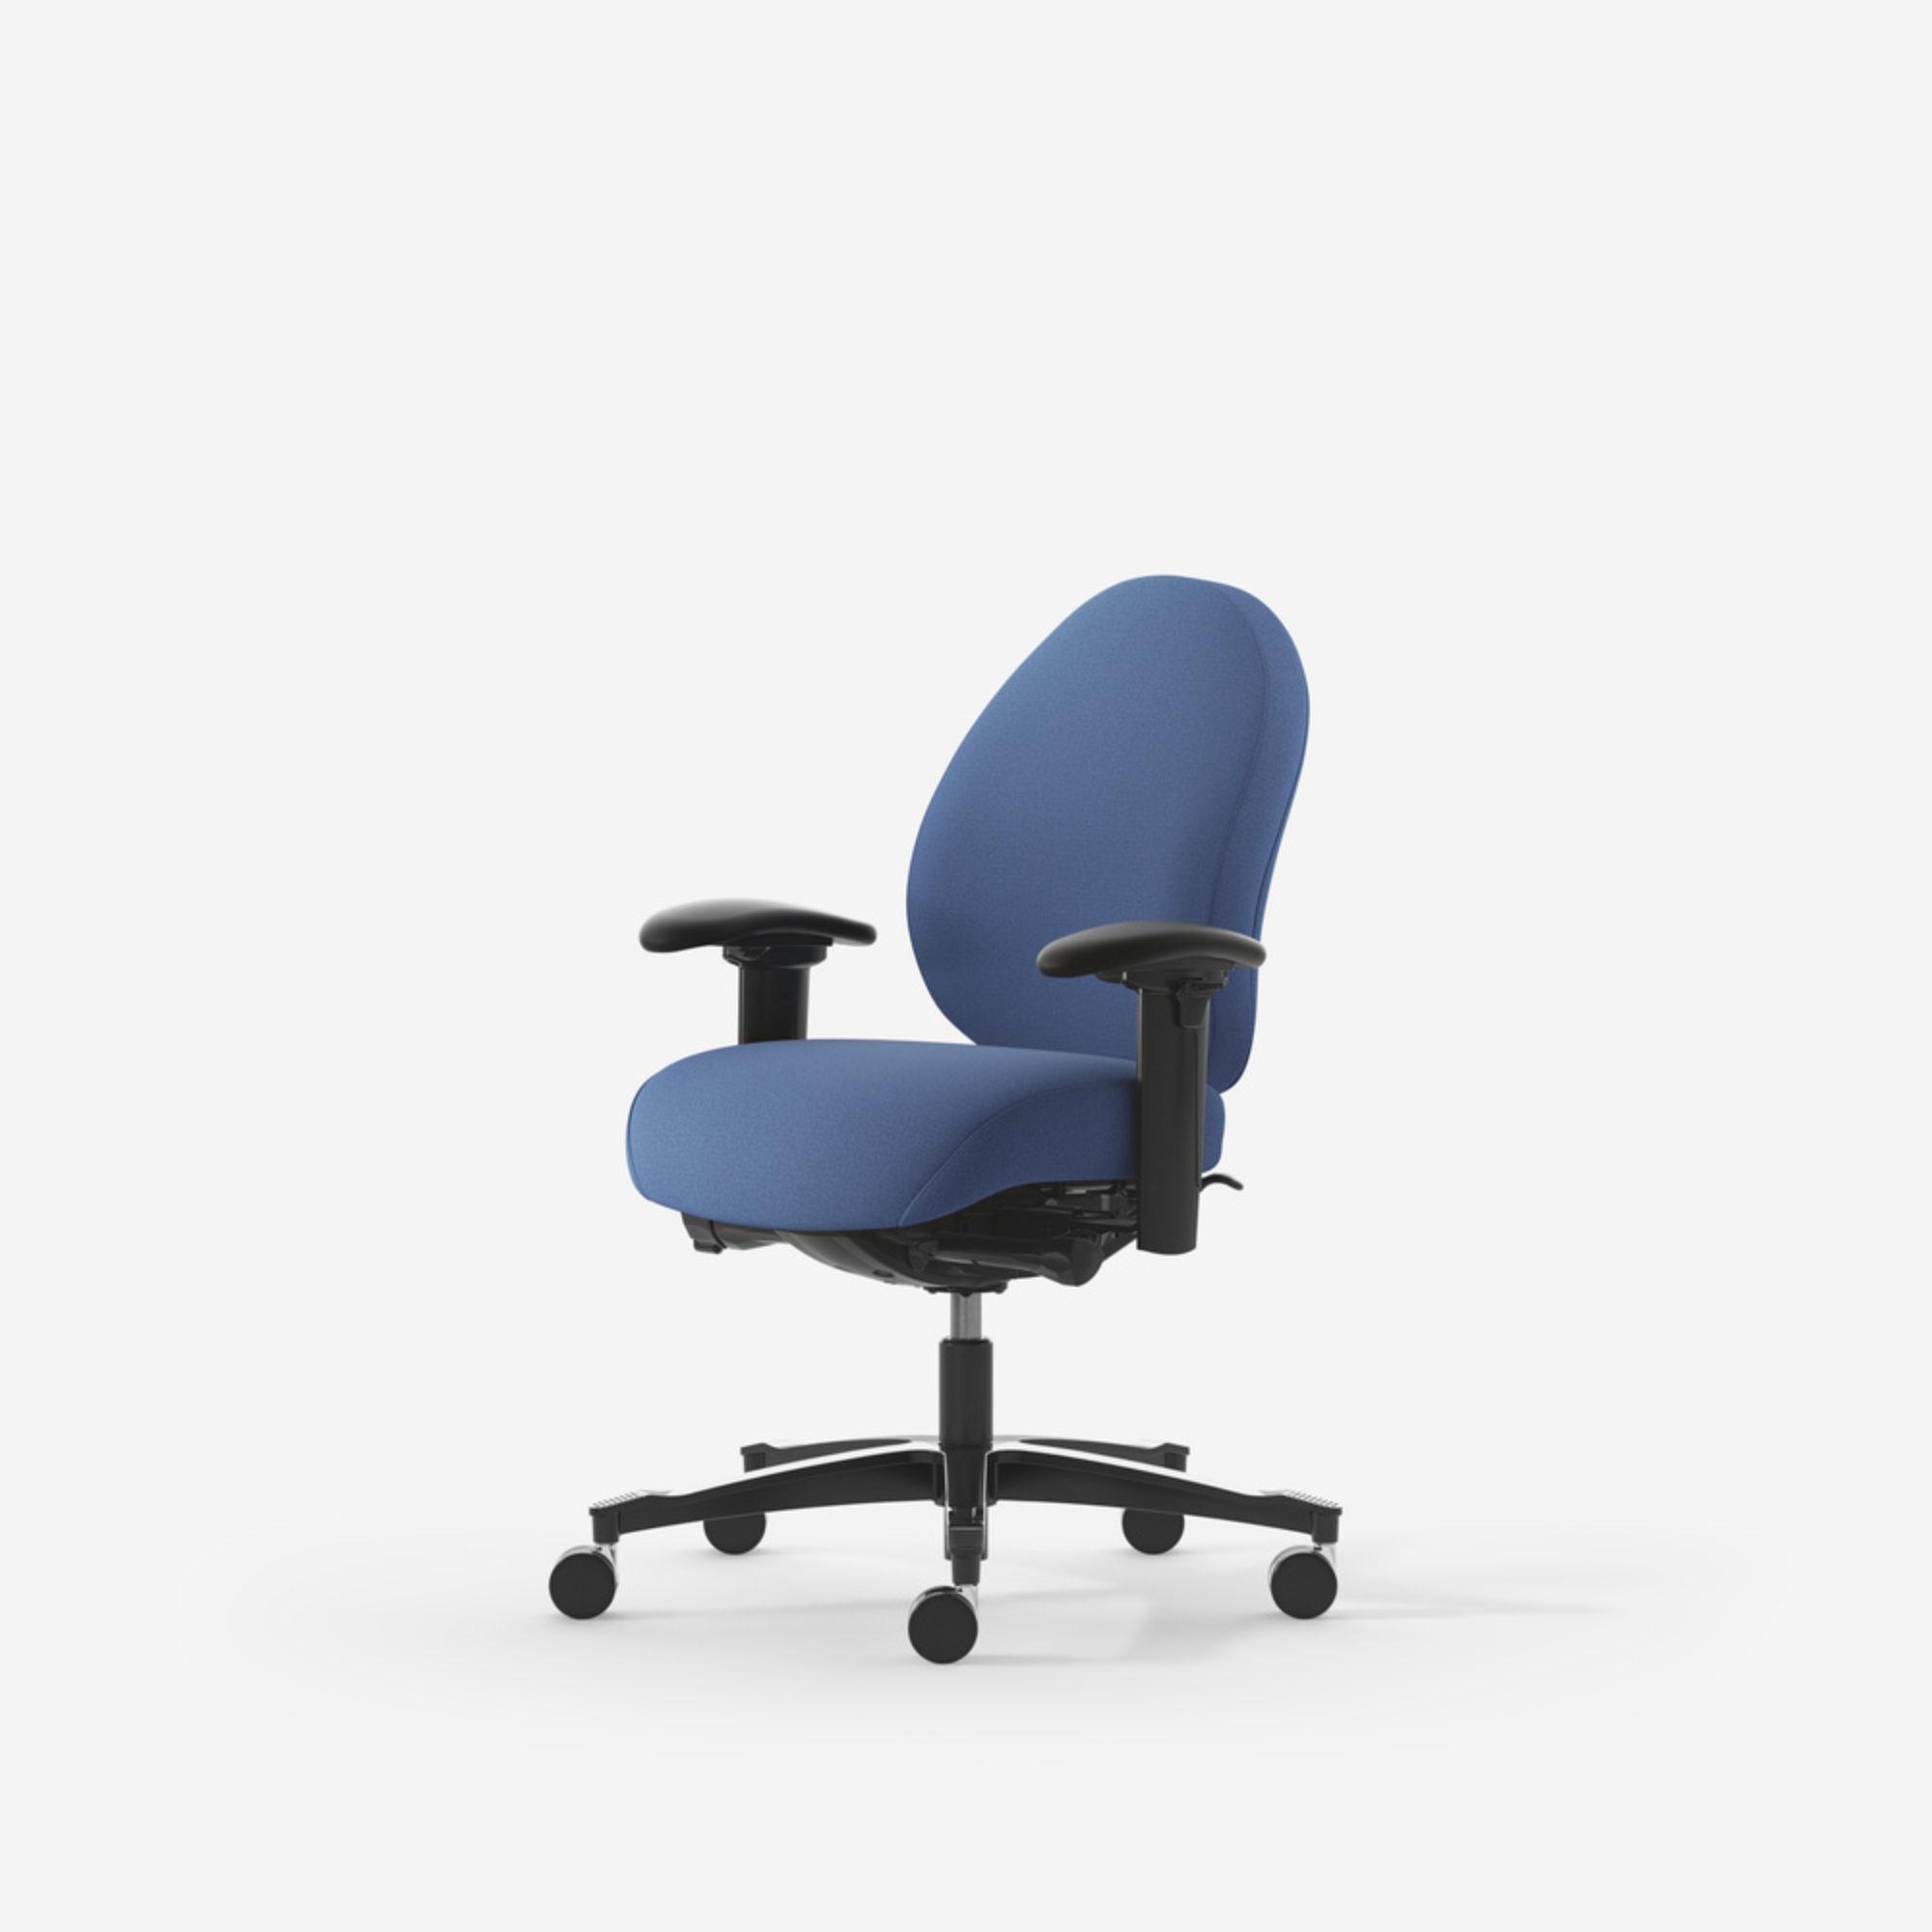 Malmstolen R7 kontorsstol ergonomisk stol